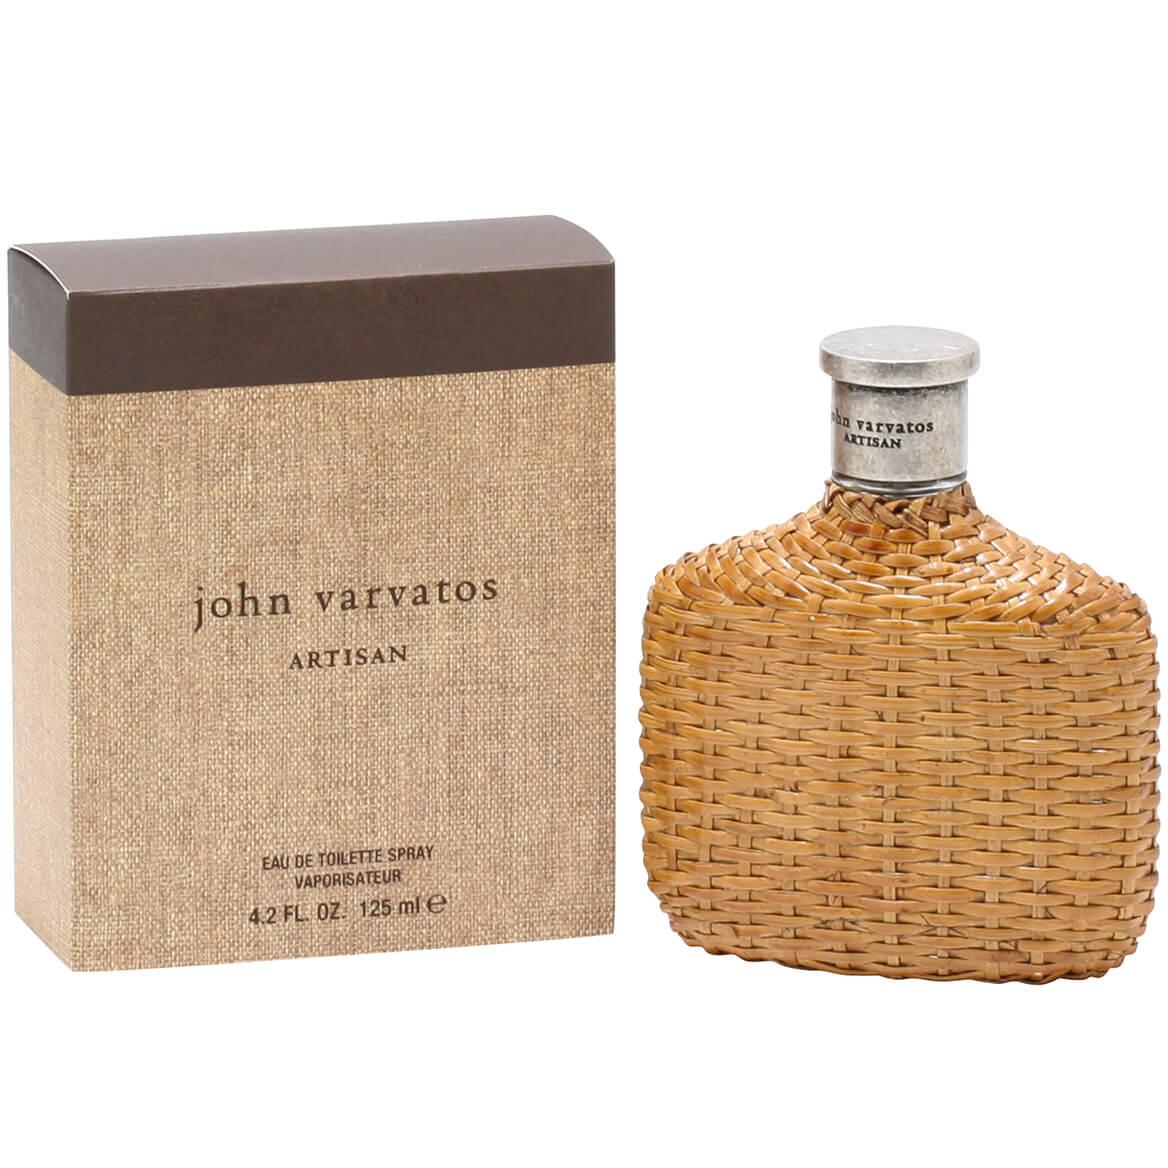 John Varvatos Artisan for Men EDT, 4.2 oz.